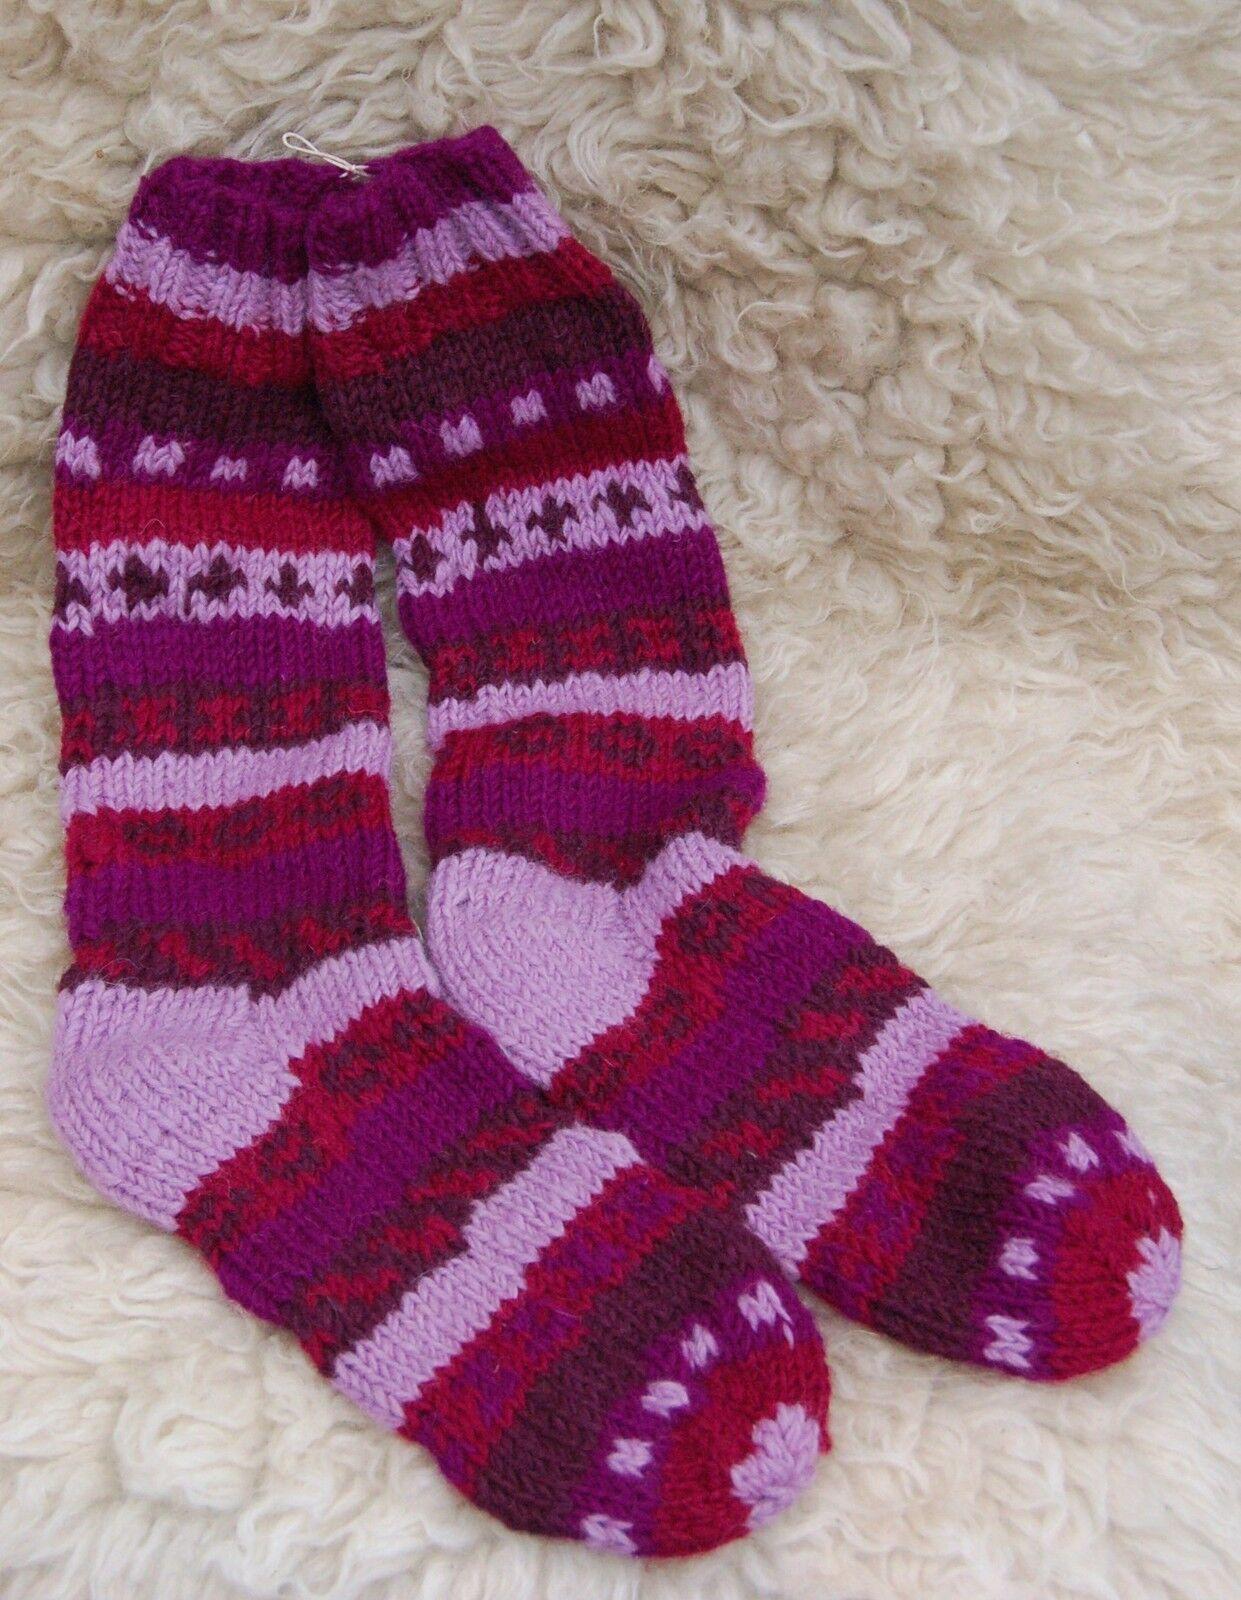 Wollsocken Wollstrümpfe Handgestrickt Nepal Strümpfe Schafwolle Warme Socken